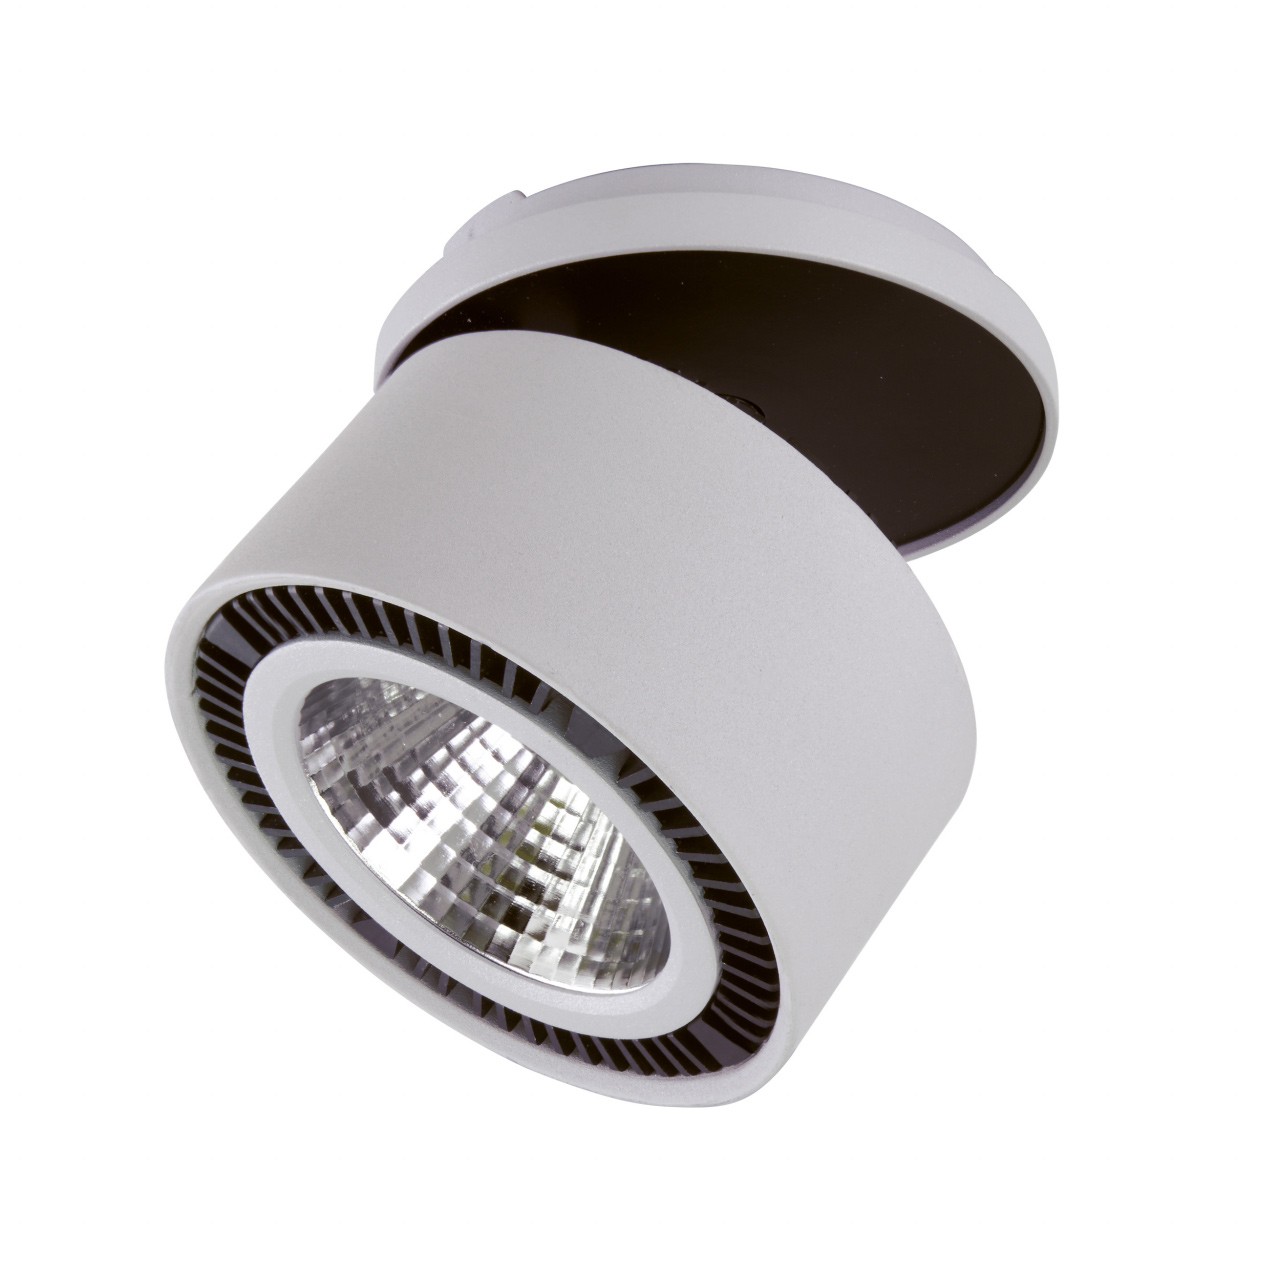 Светильник Forte inca LED 40W 3400LM 30G белый 3000K Lightstar 213840